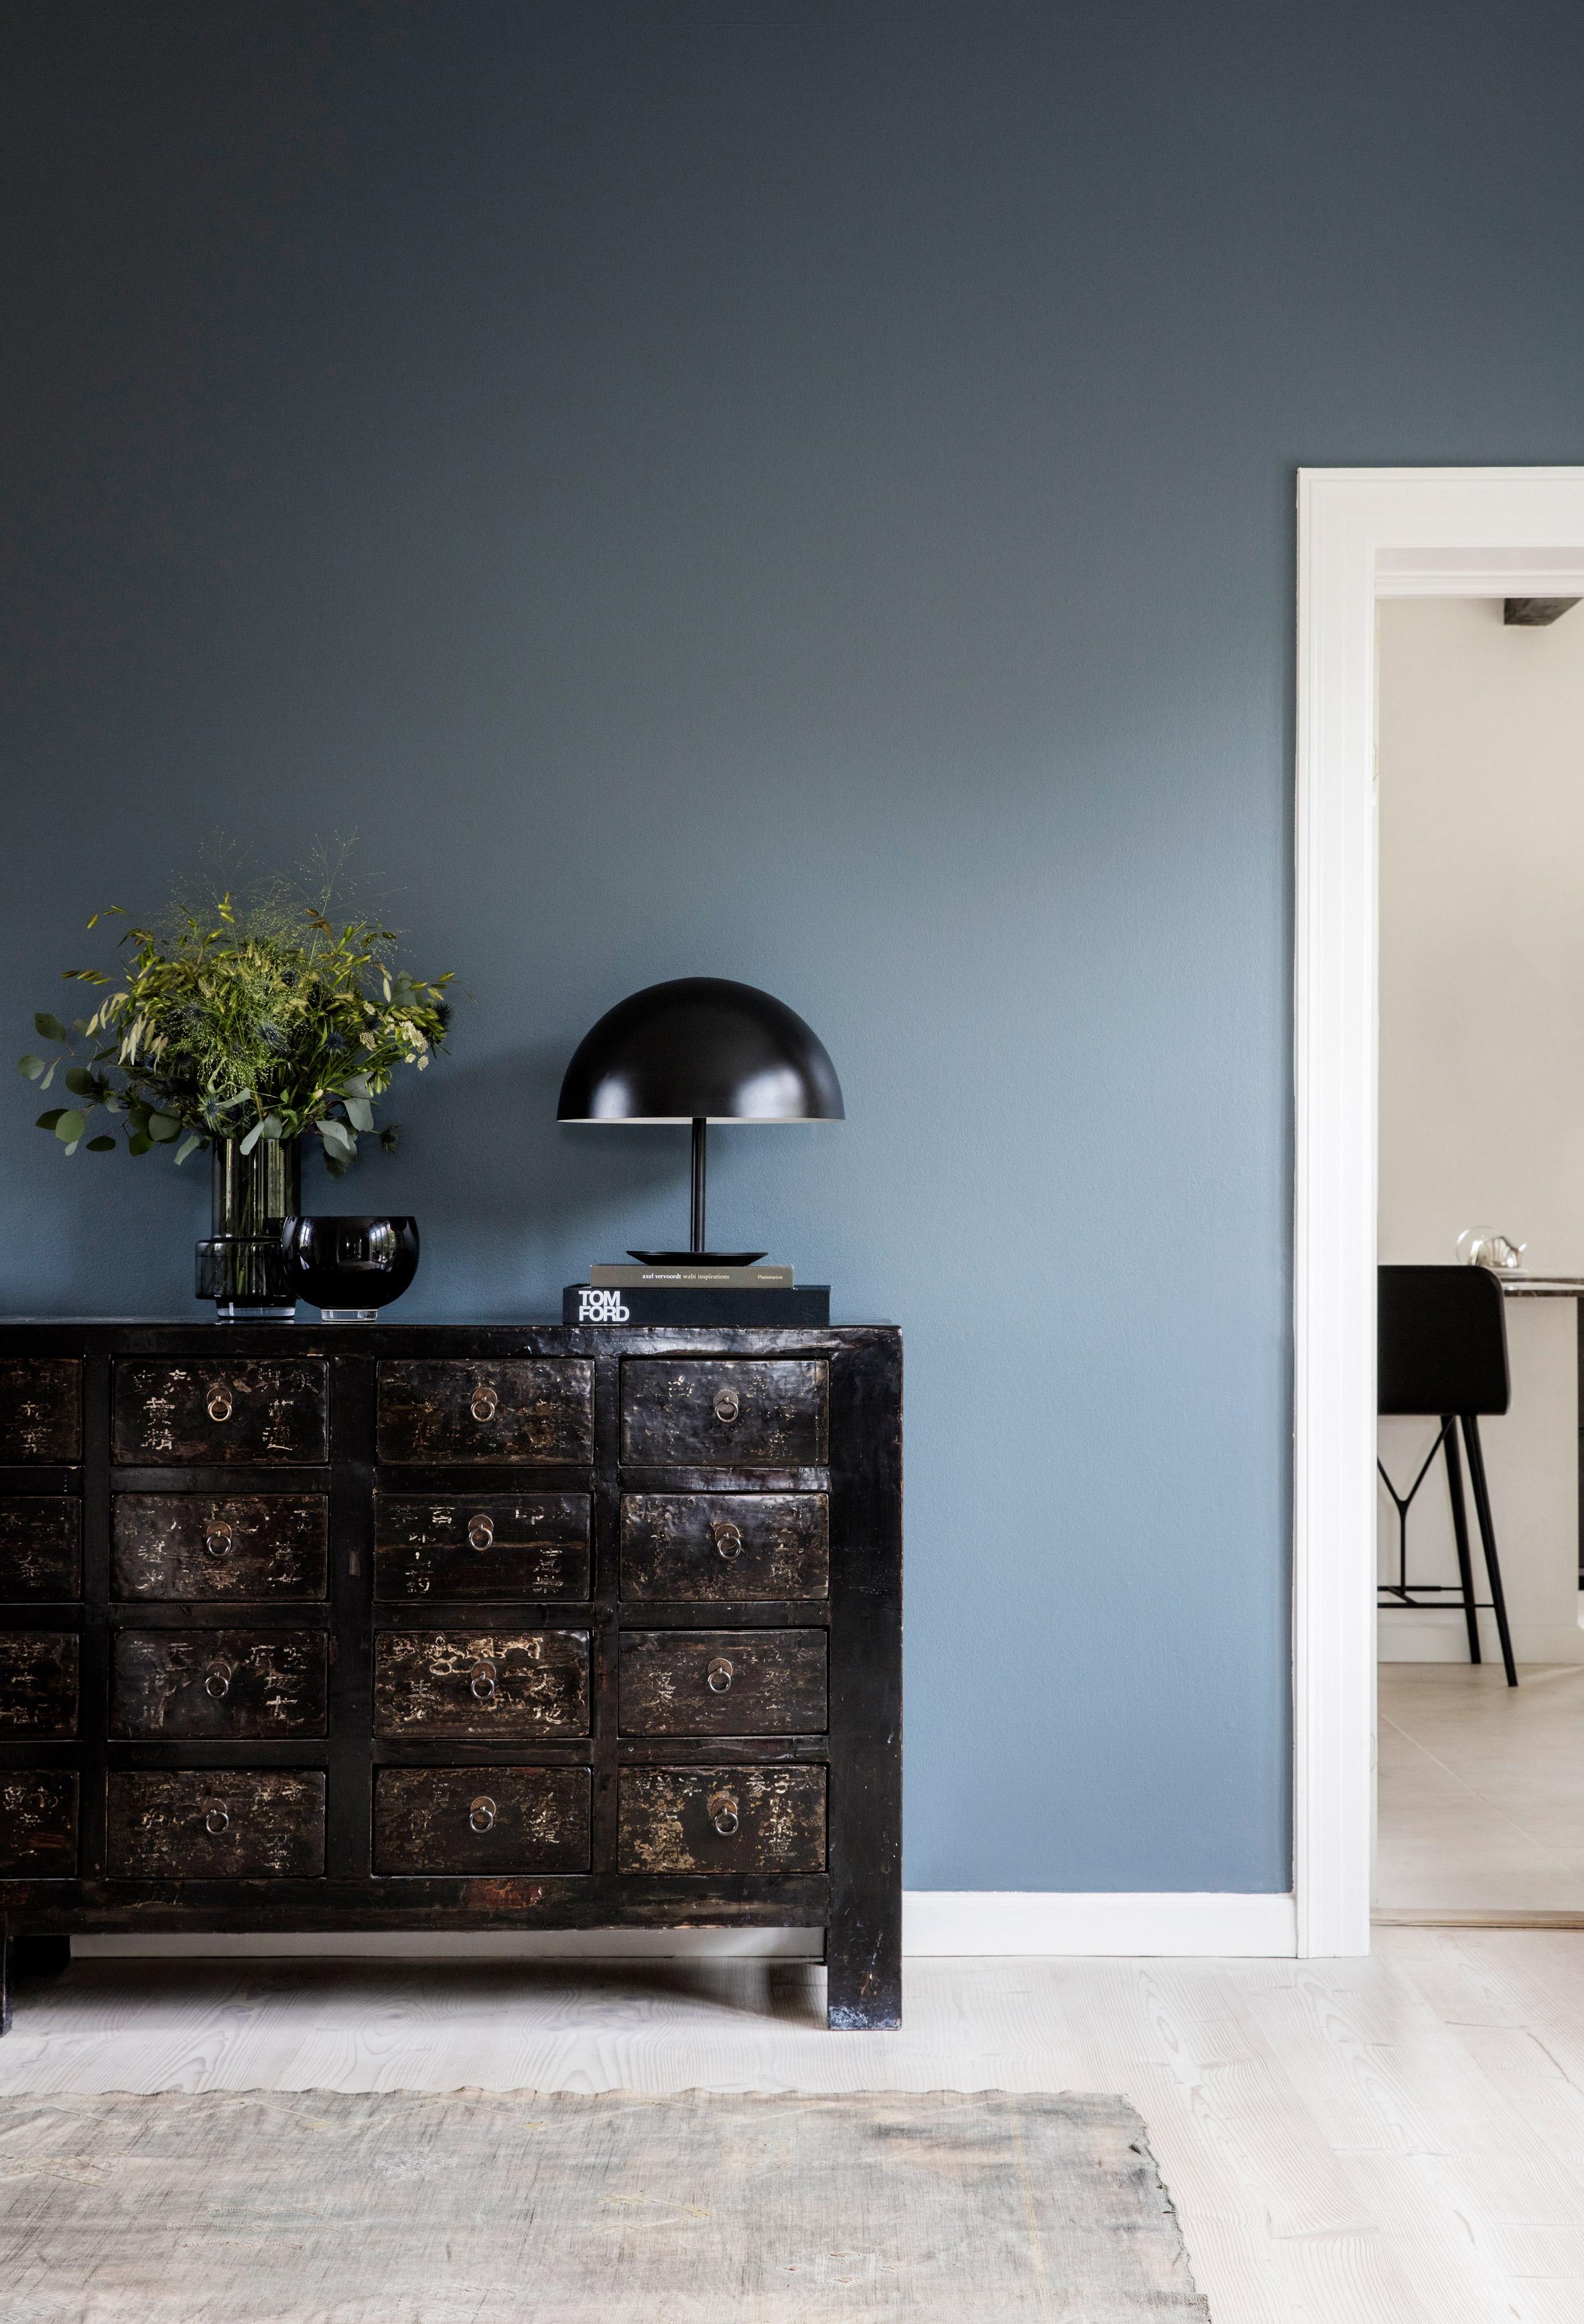 elledecoration vn nhà màu trung tính kaja-moller-home-fredericia-interiors-residential-copenhagen 5